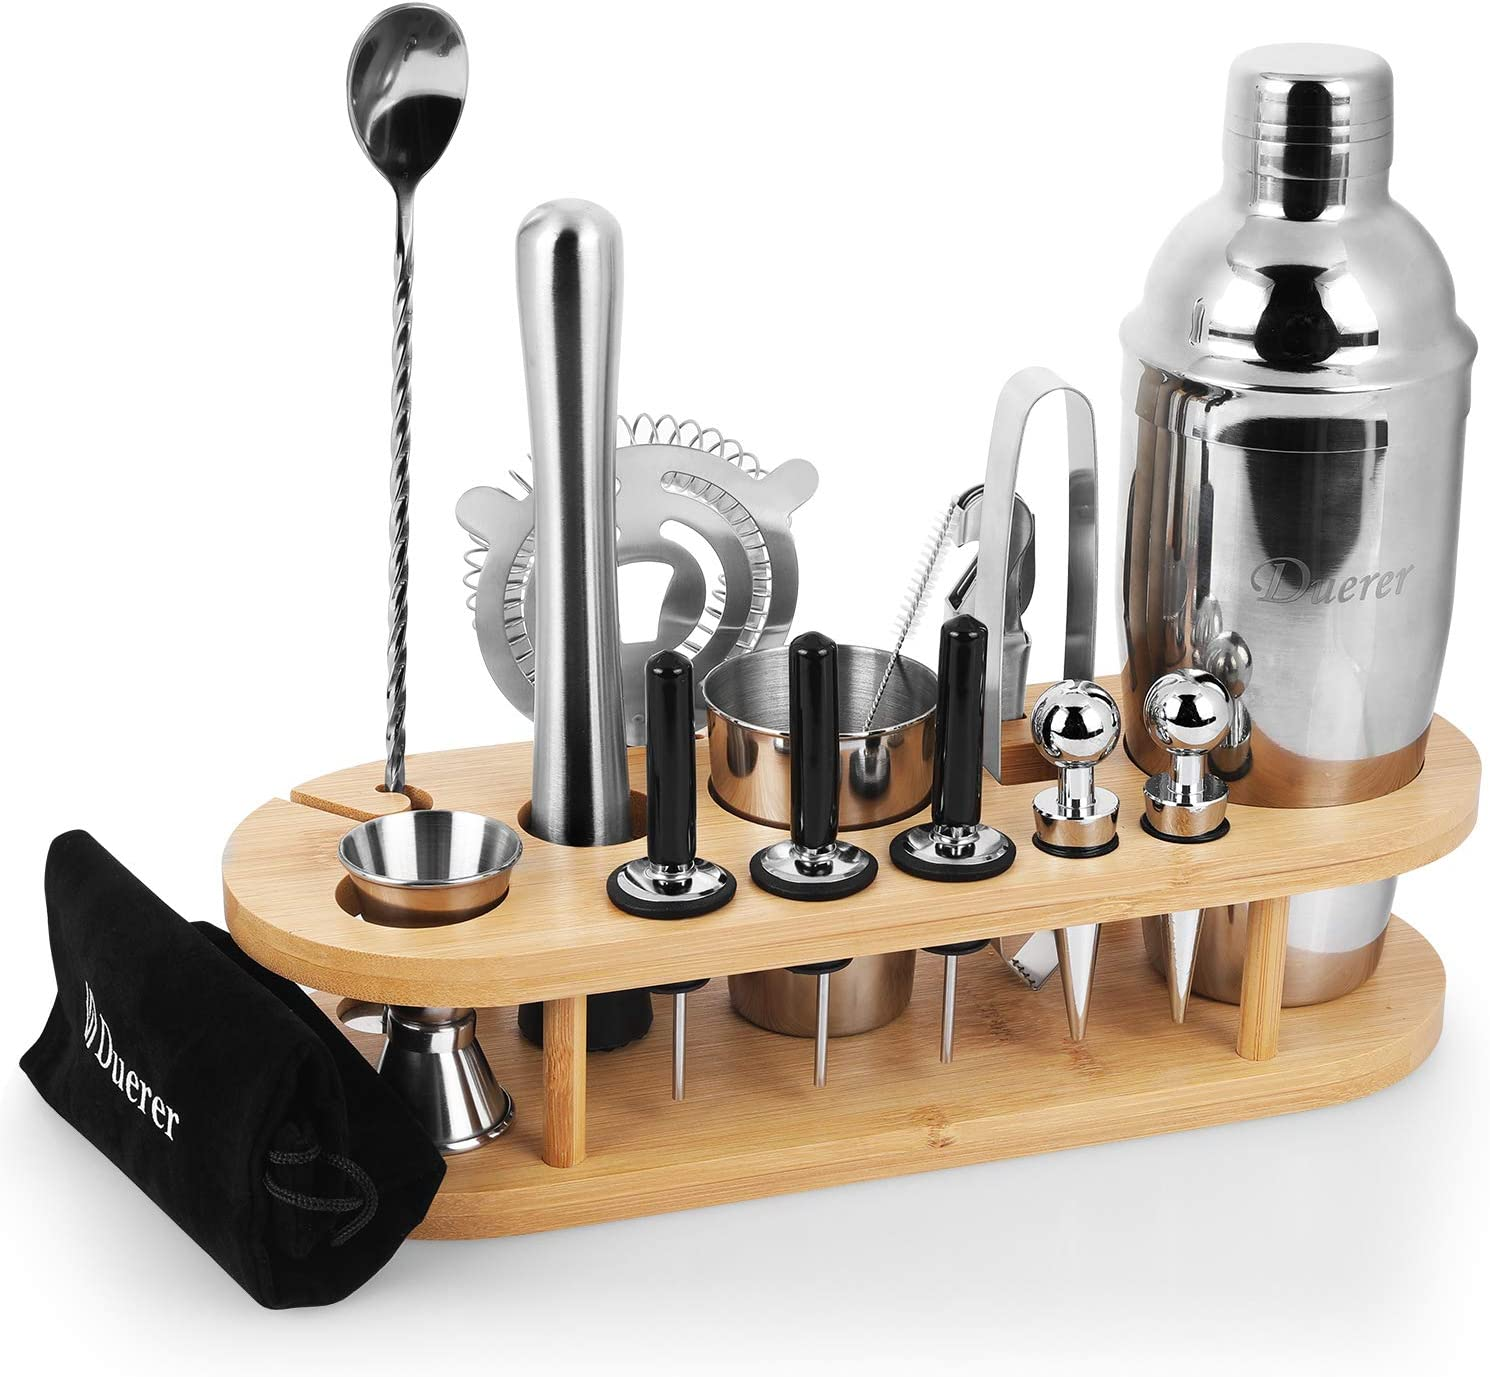 Duerer Bartender Kit con soporte, conjunto de coctelera de 23 piezas con elegante soporte de bambú, Perfect Home Bar Tool Set y kit profesional ...